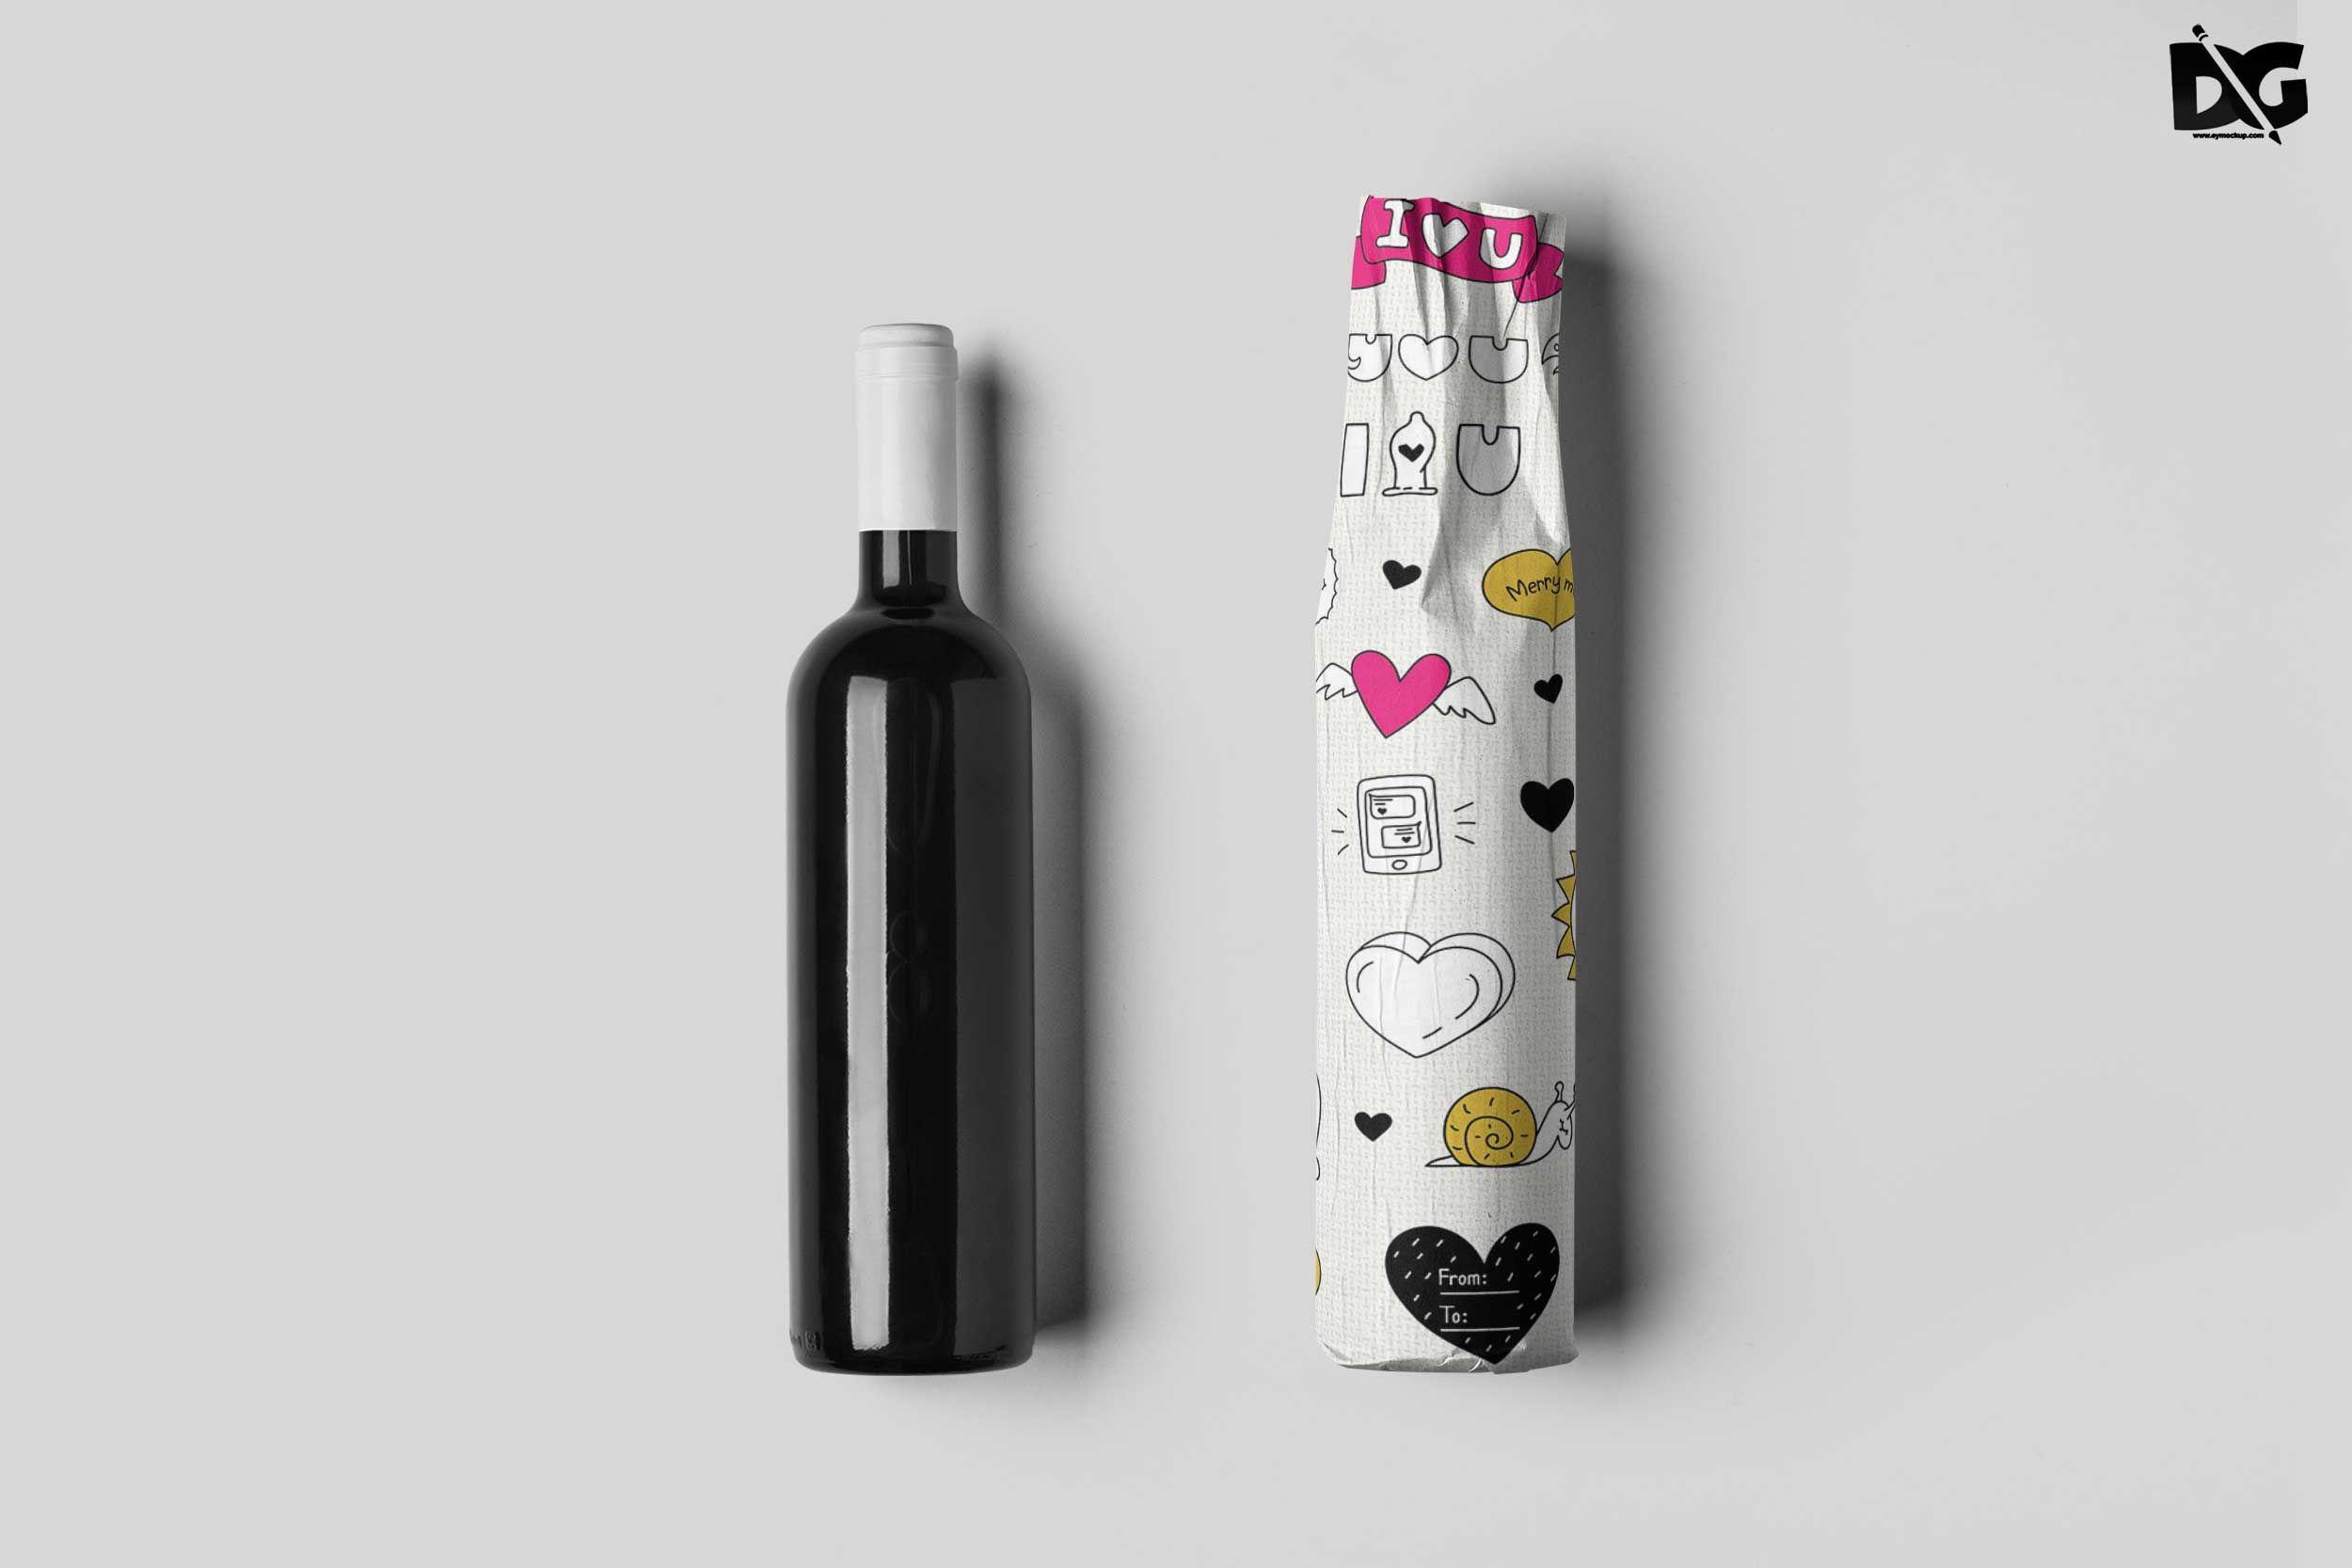 Free Black Wine Bottle Wrapped Psd Artwork Mockup Artworkmockup Psdartwork Psdartworkmockup Psdmockup Bot Bottle Mockup Logo Design Mockup Mockup Free Psd